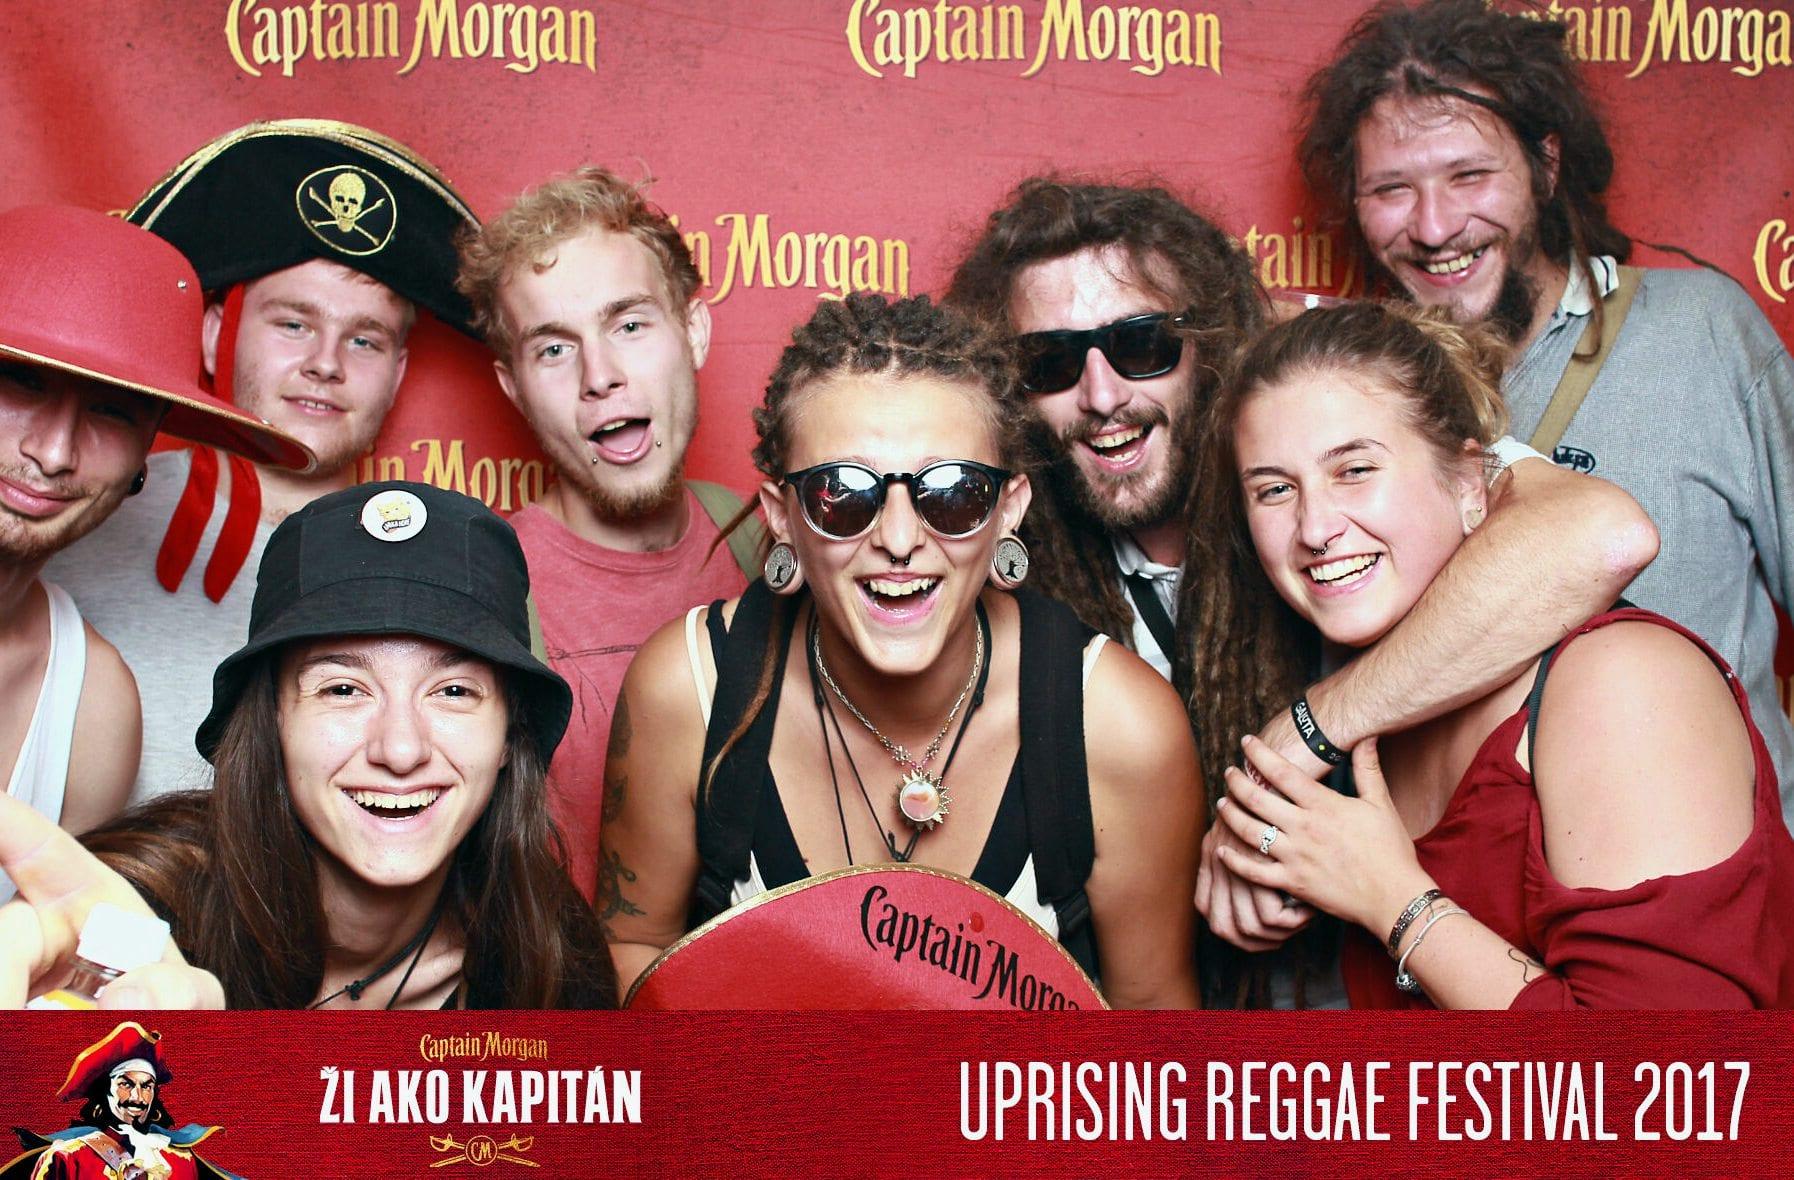 fotokoutek-captain-morgan-26-8-2017-298938